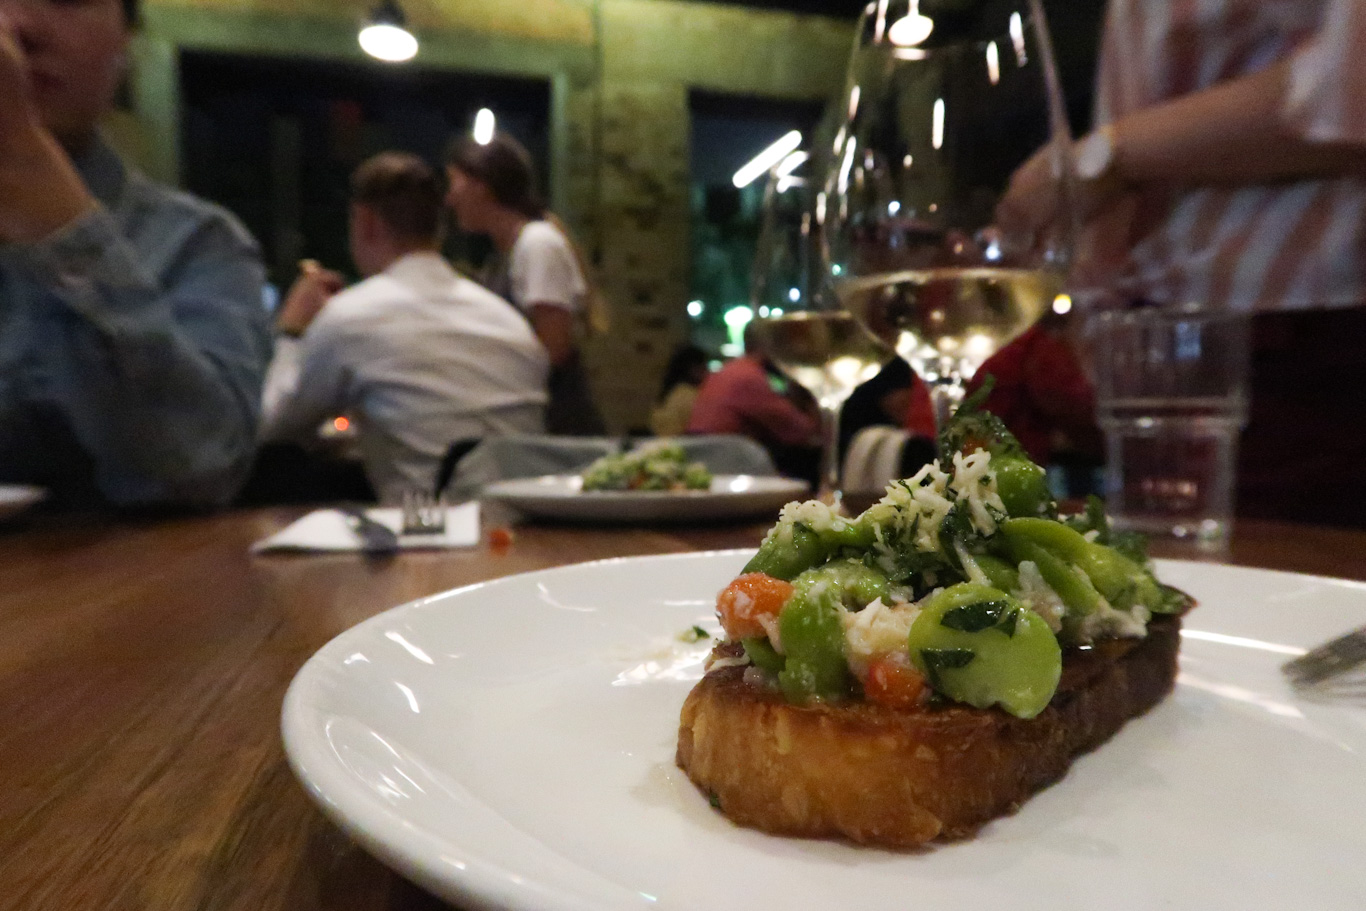 entrée julius pizzeria brisbane australia italian food tartine